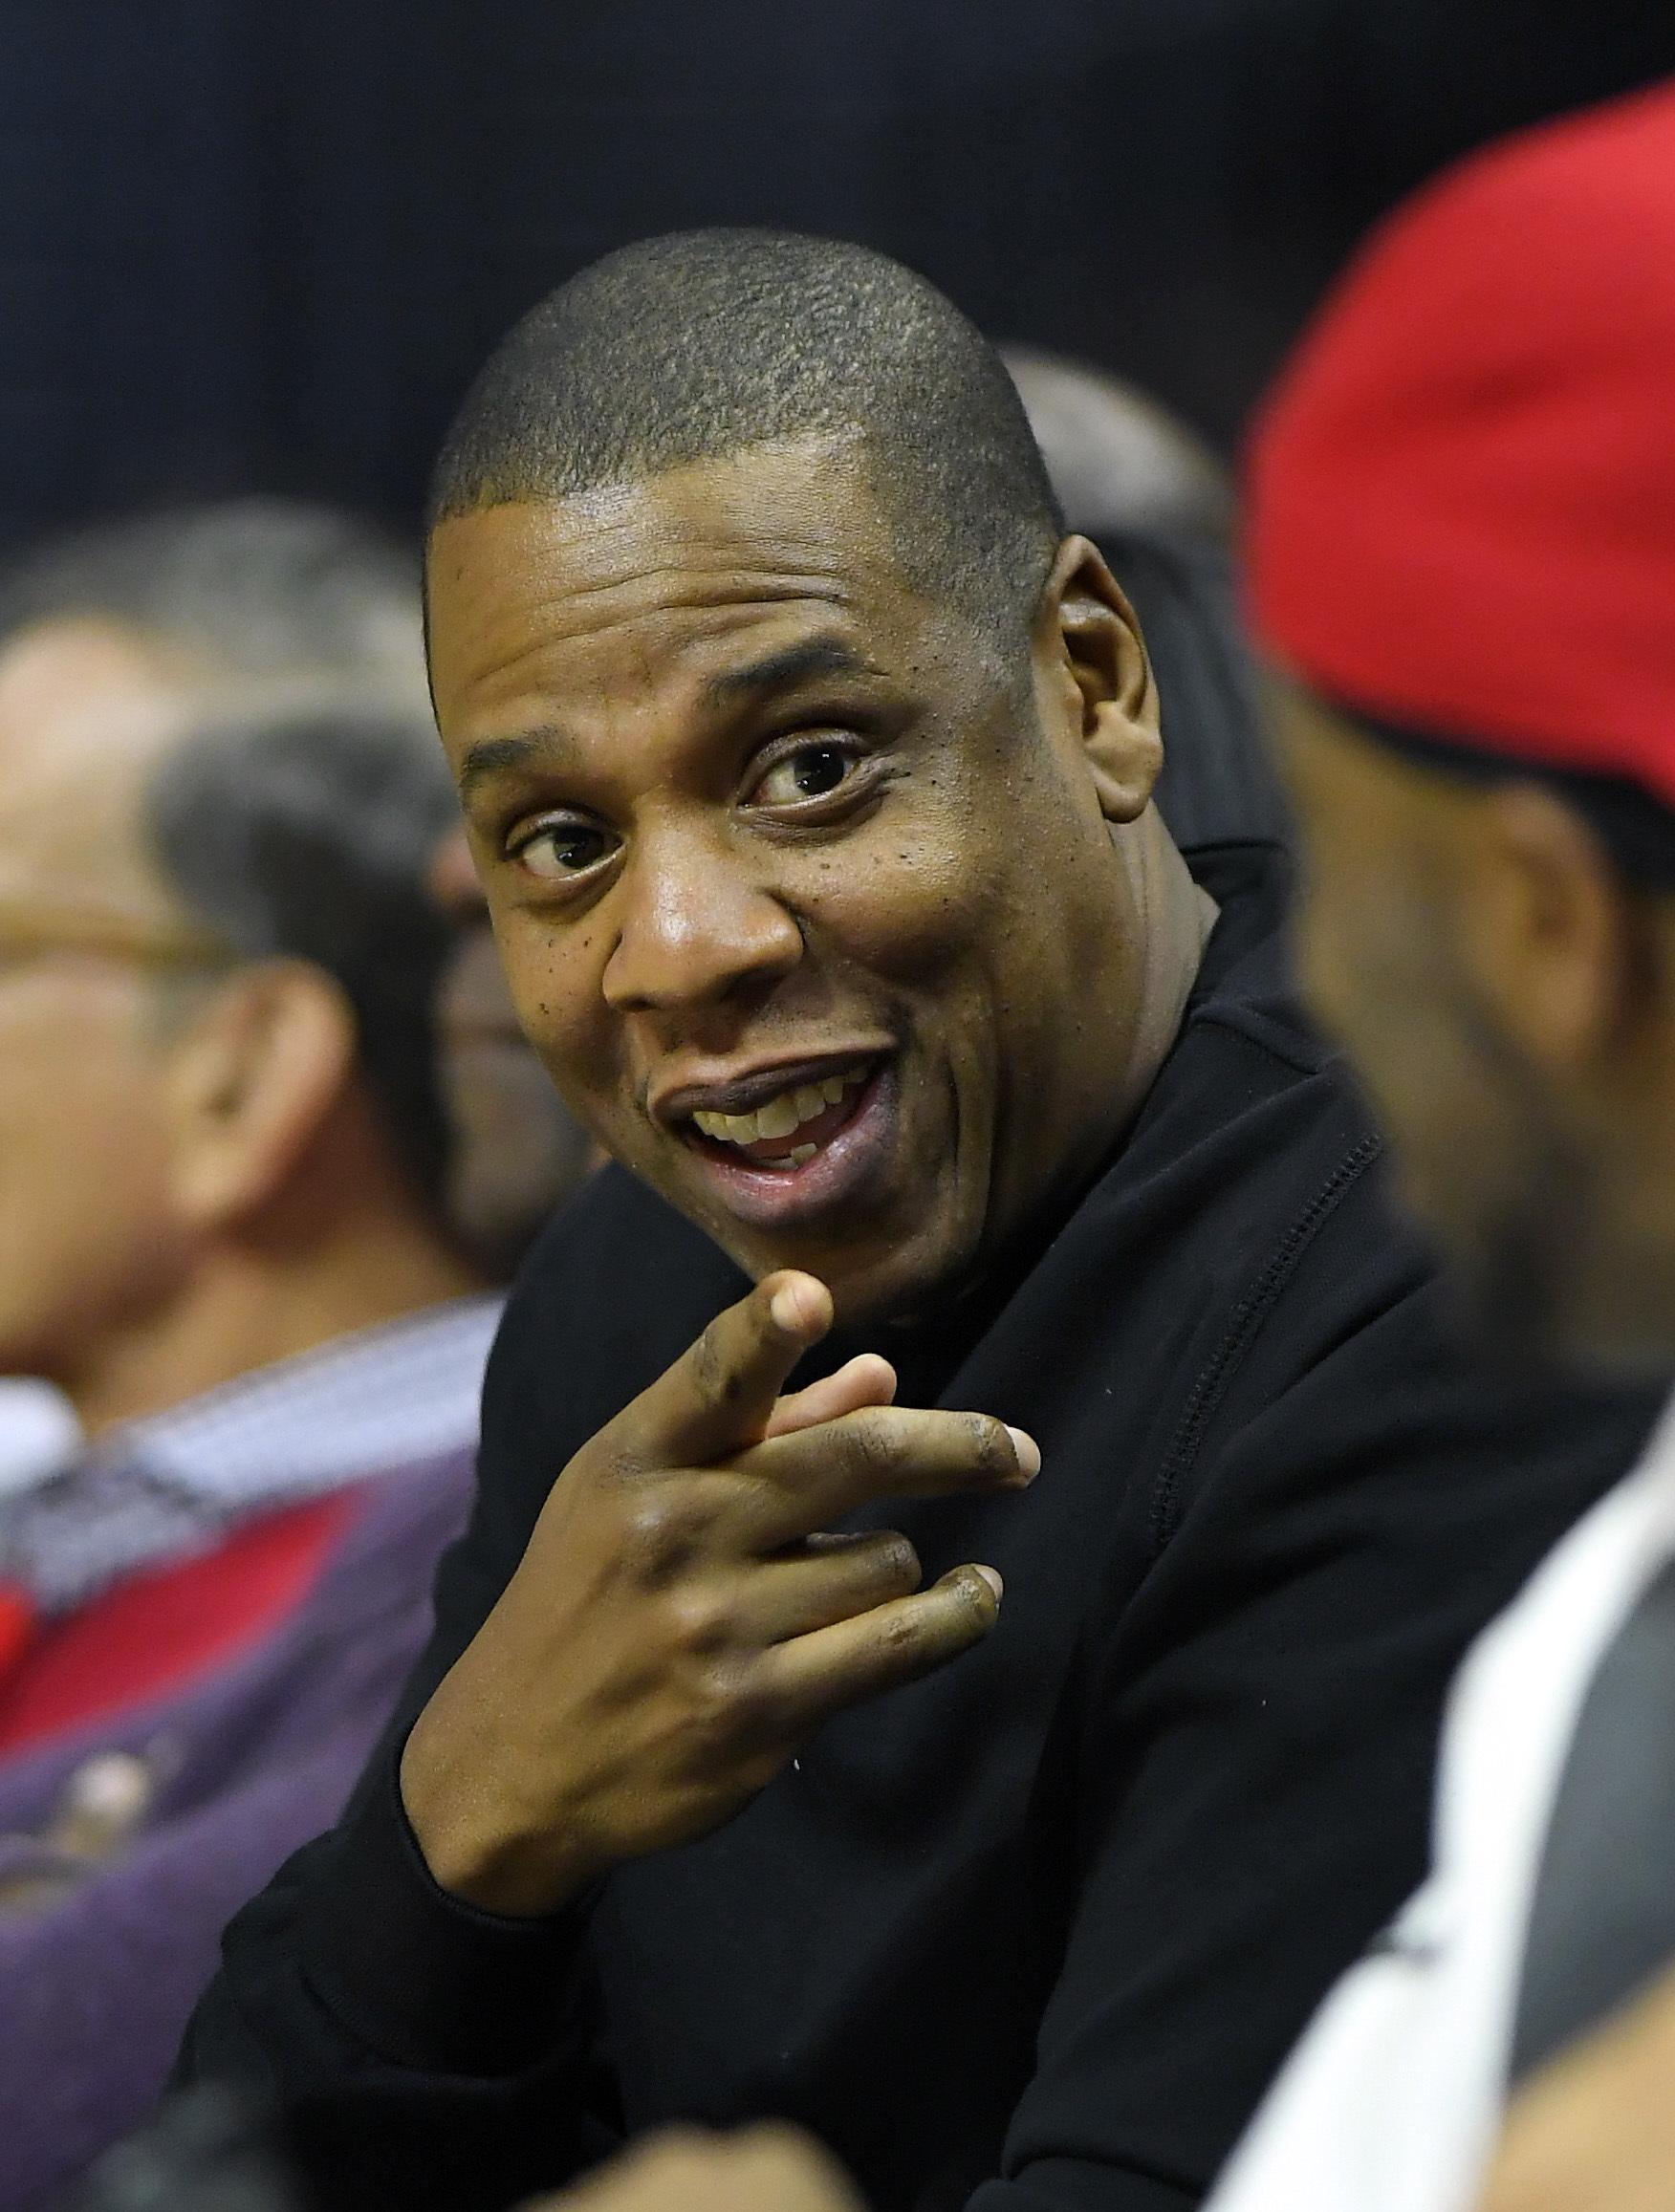 cb4bb4cac Jay-Z sends a message